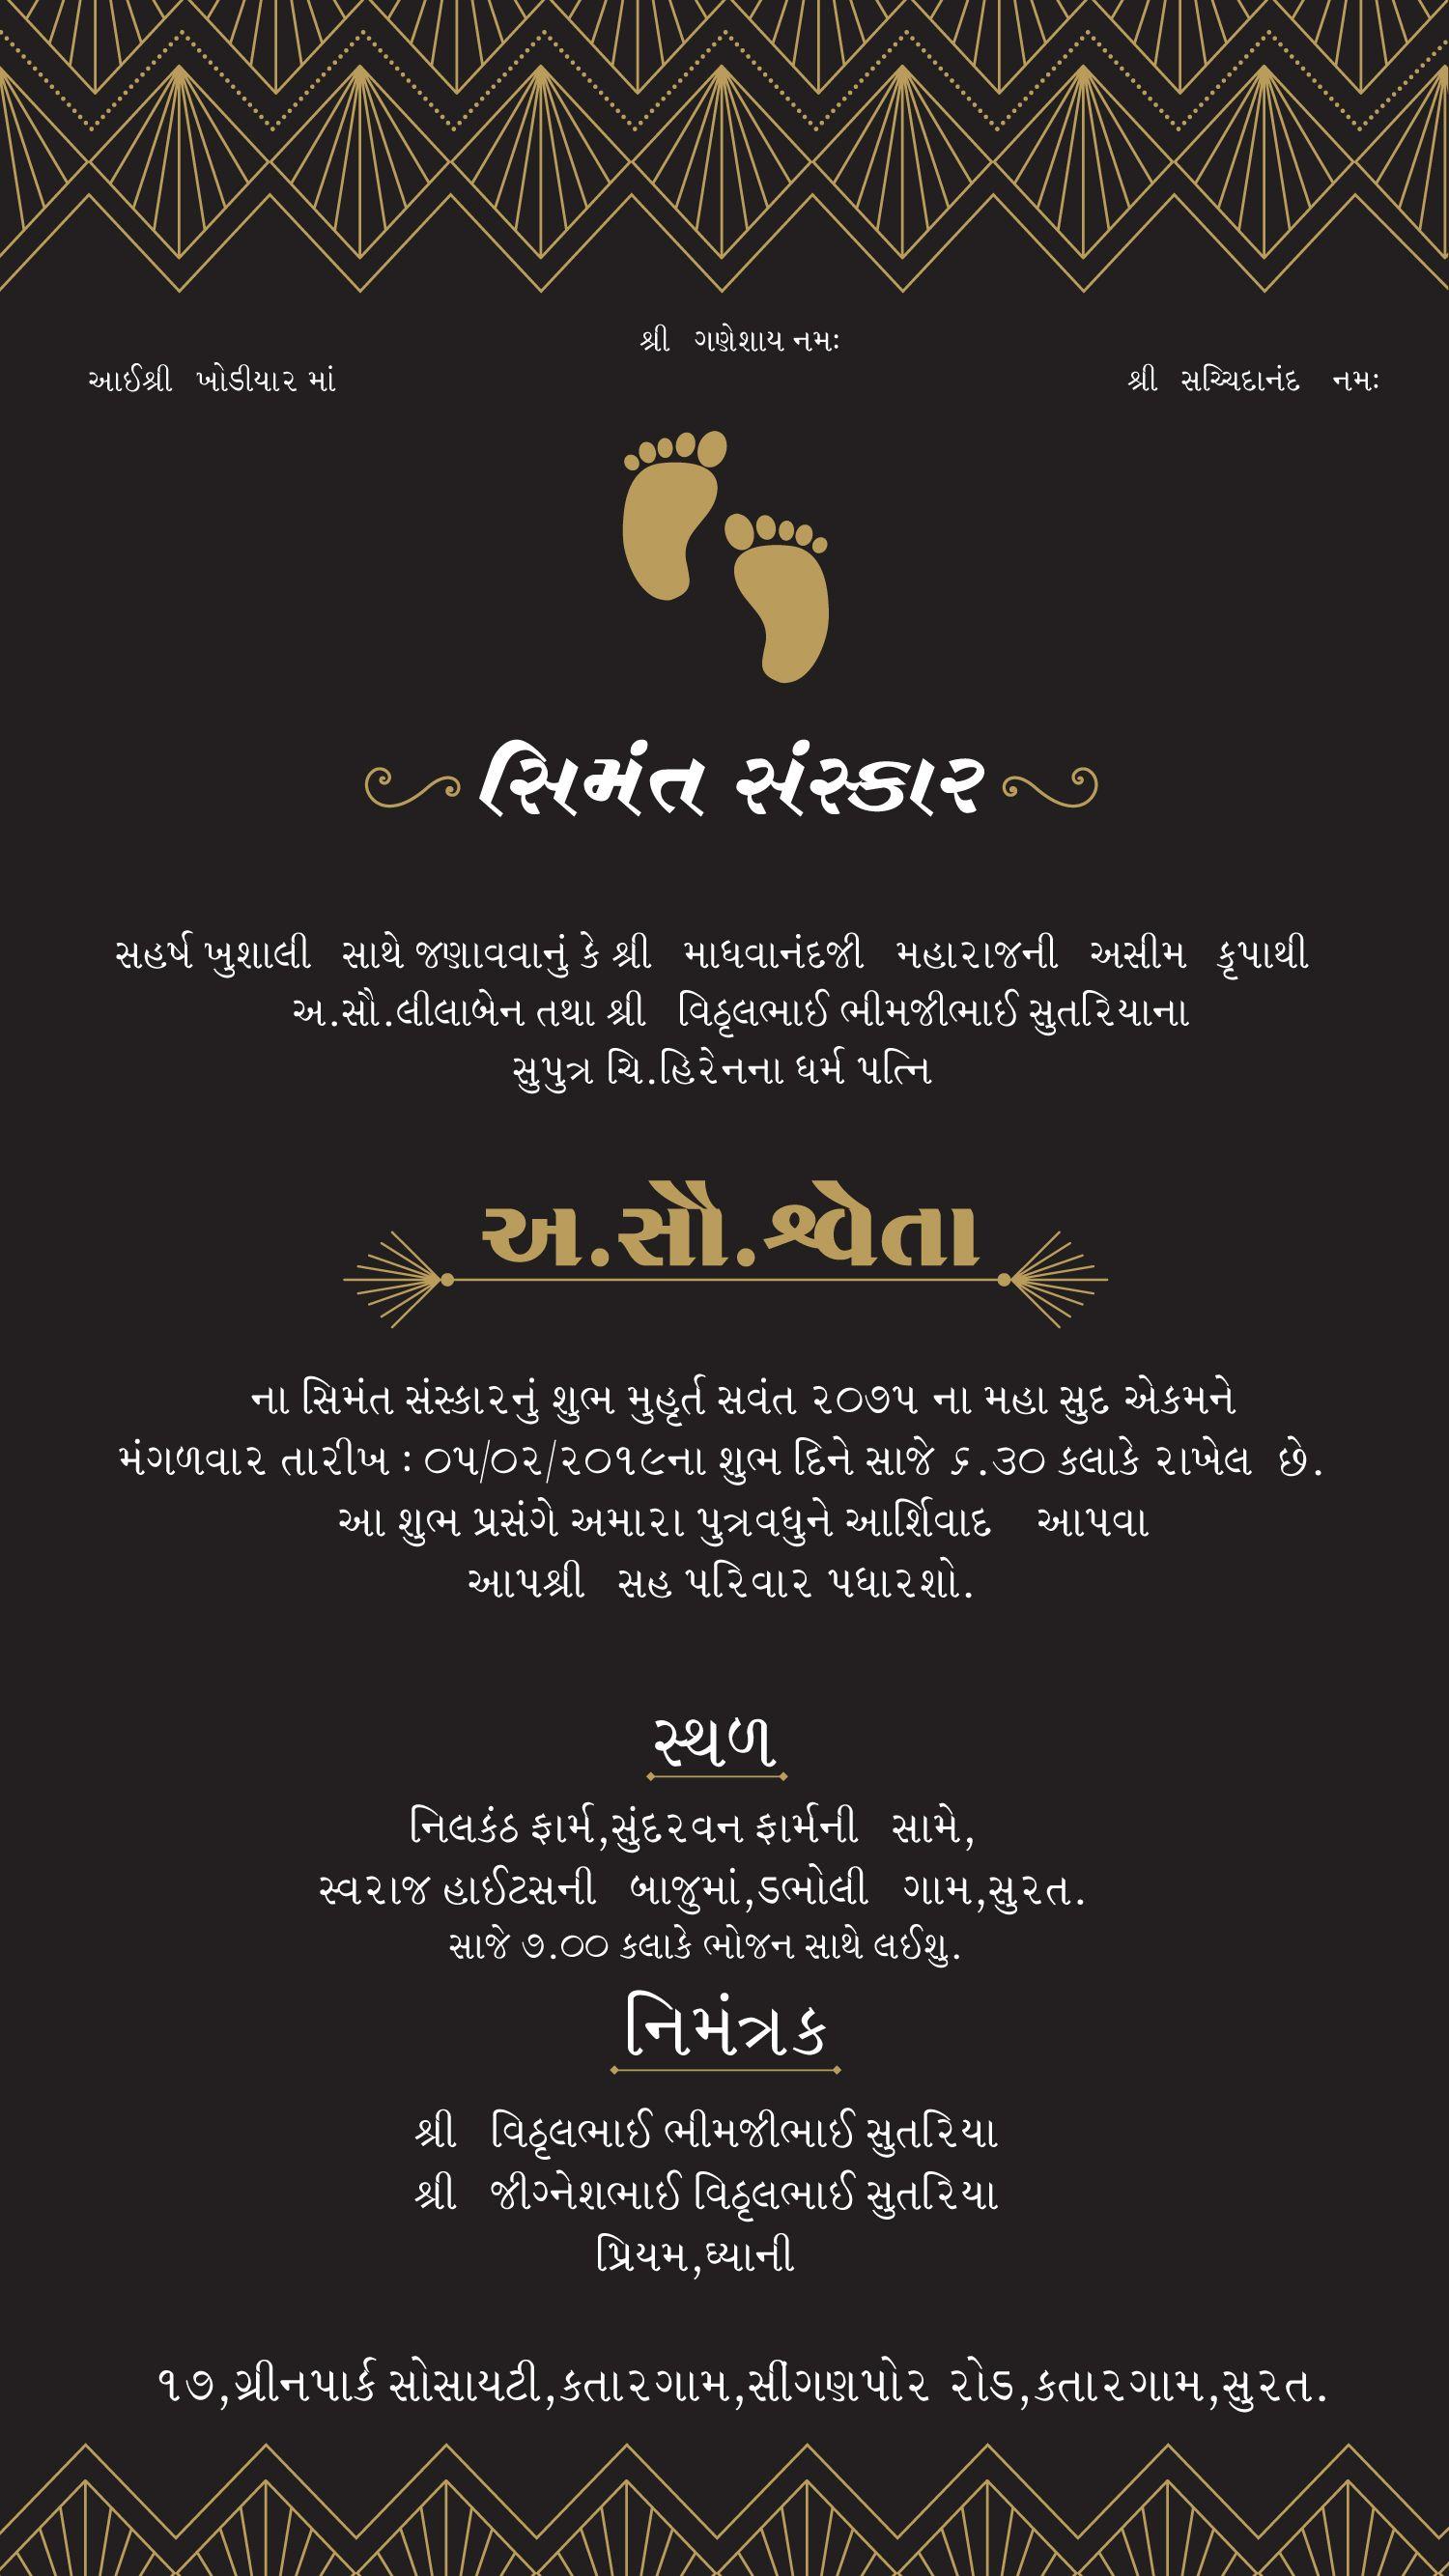 gujarati kankotri writing - Chalisa